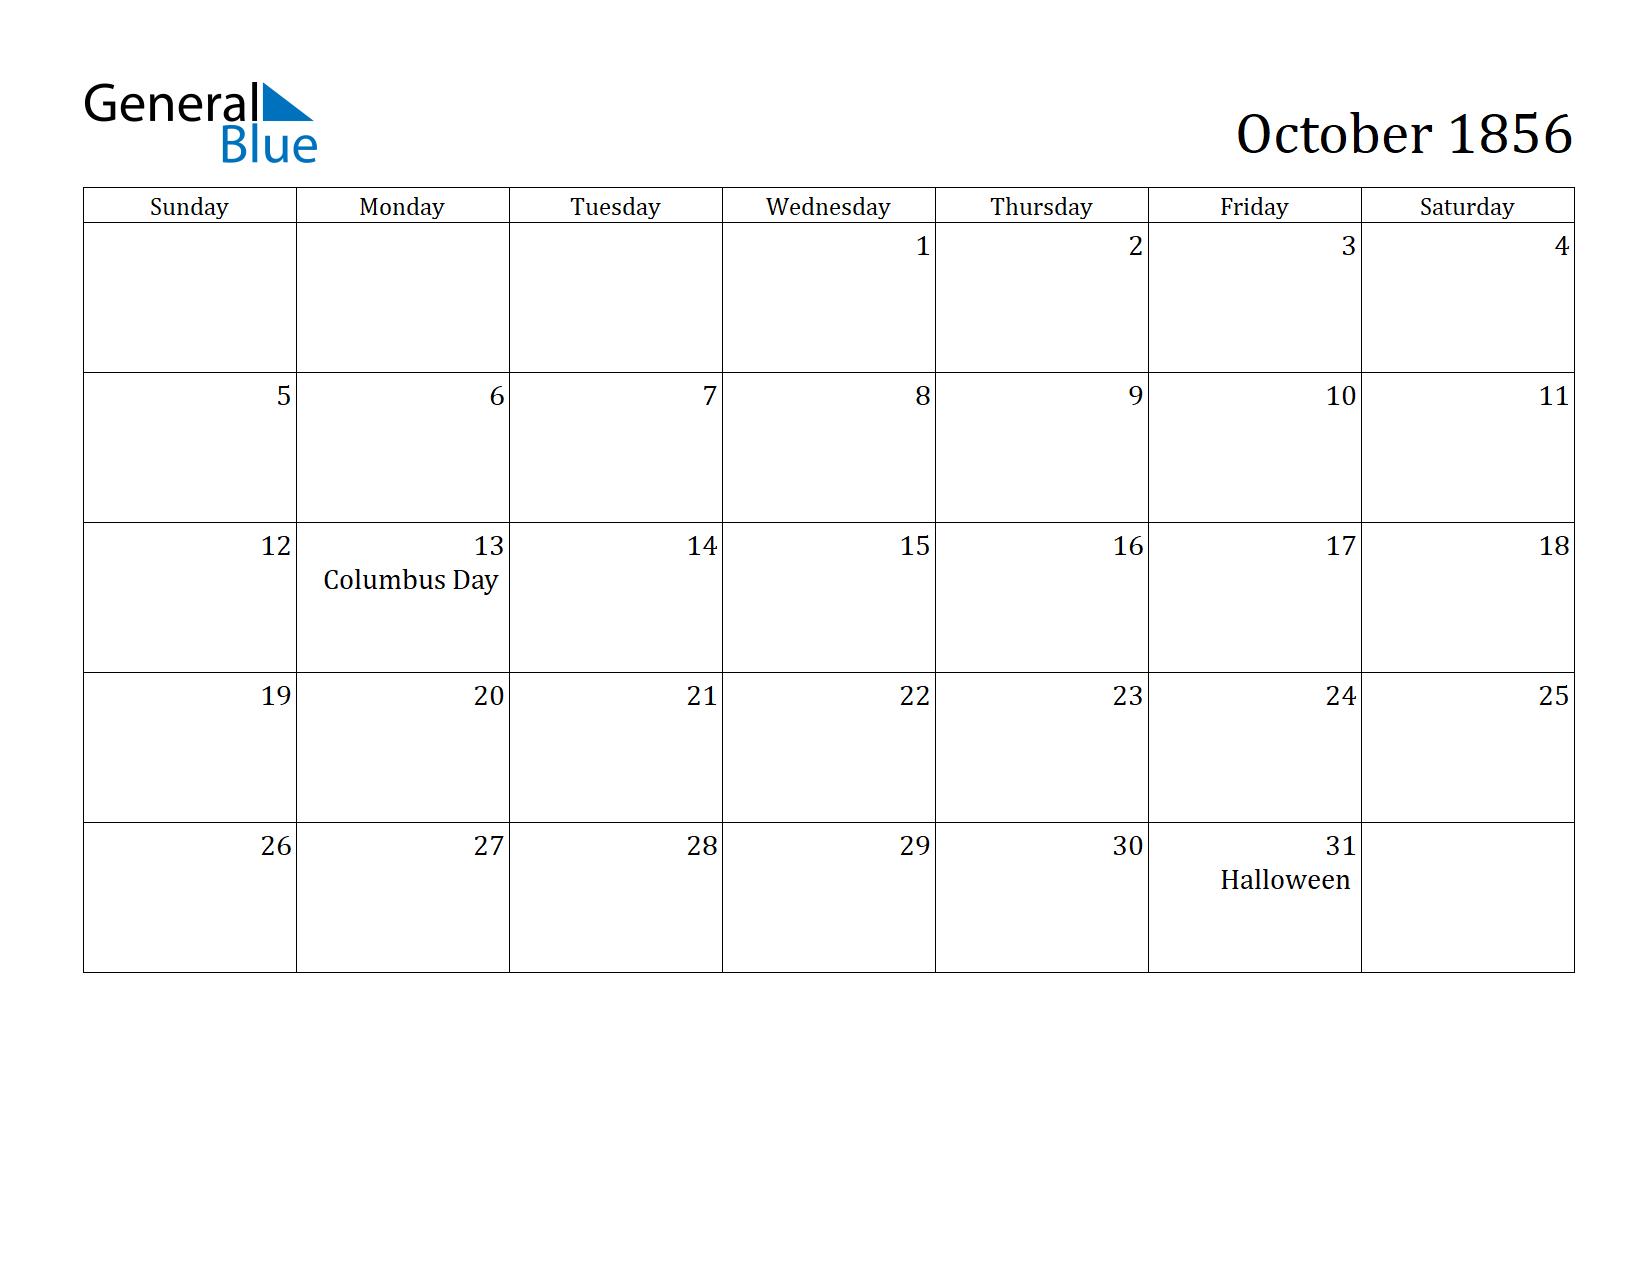 Image of October 1856 Calendar